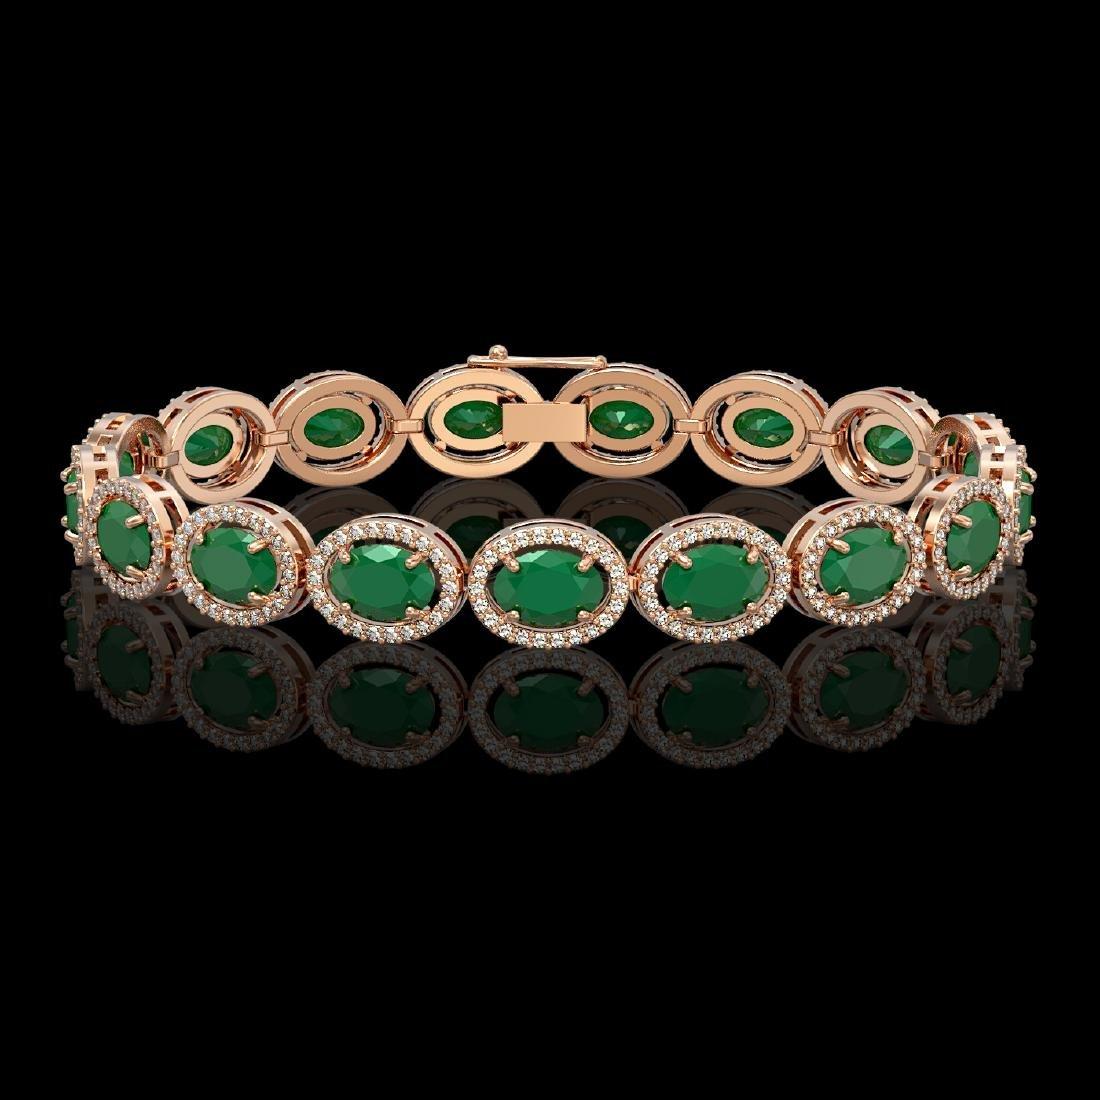 22.89 CTW Emerald & Diamond Halo Bracelet 10K Rose Gold